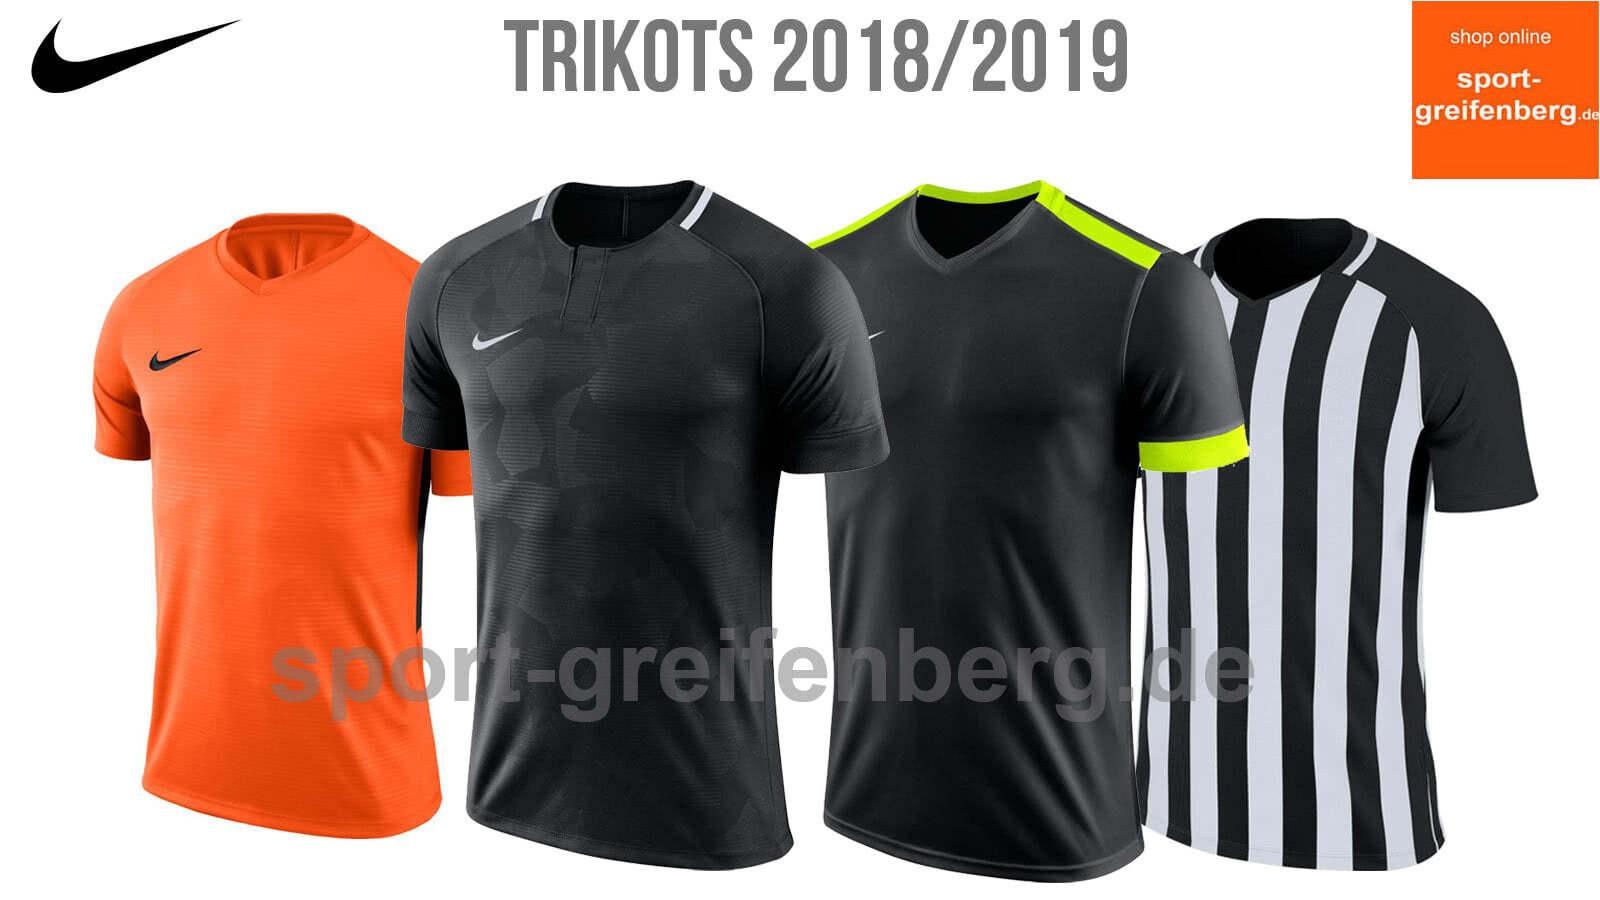 Nike Trikots 2018/2019 (alle neue Trikots / Jerseys) - Katalog